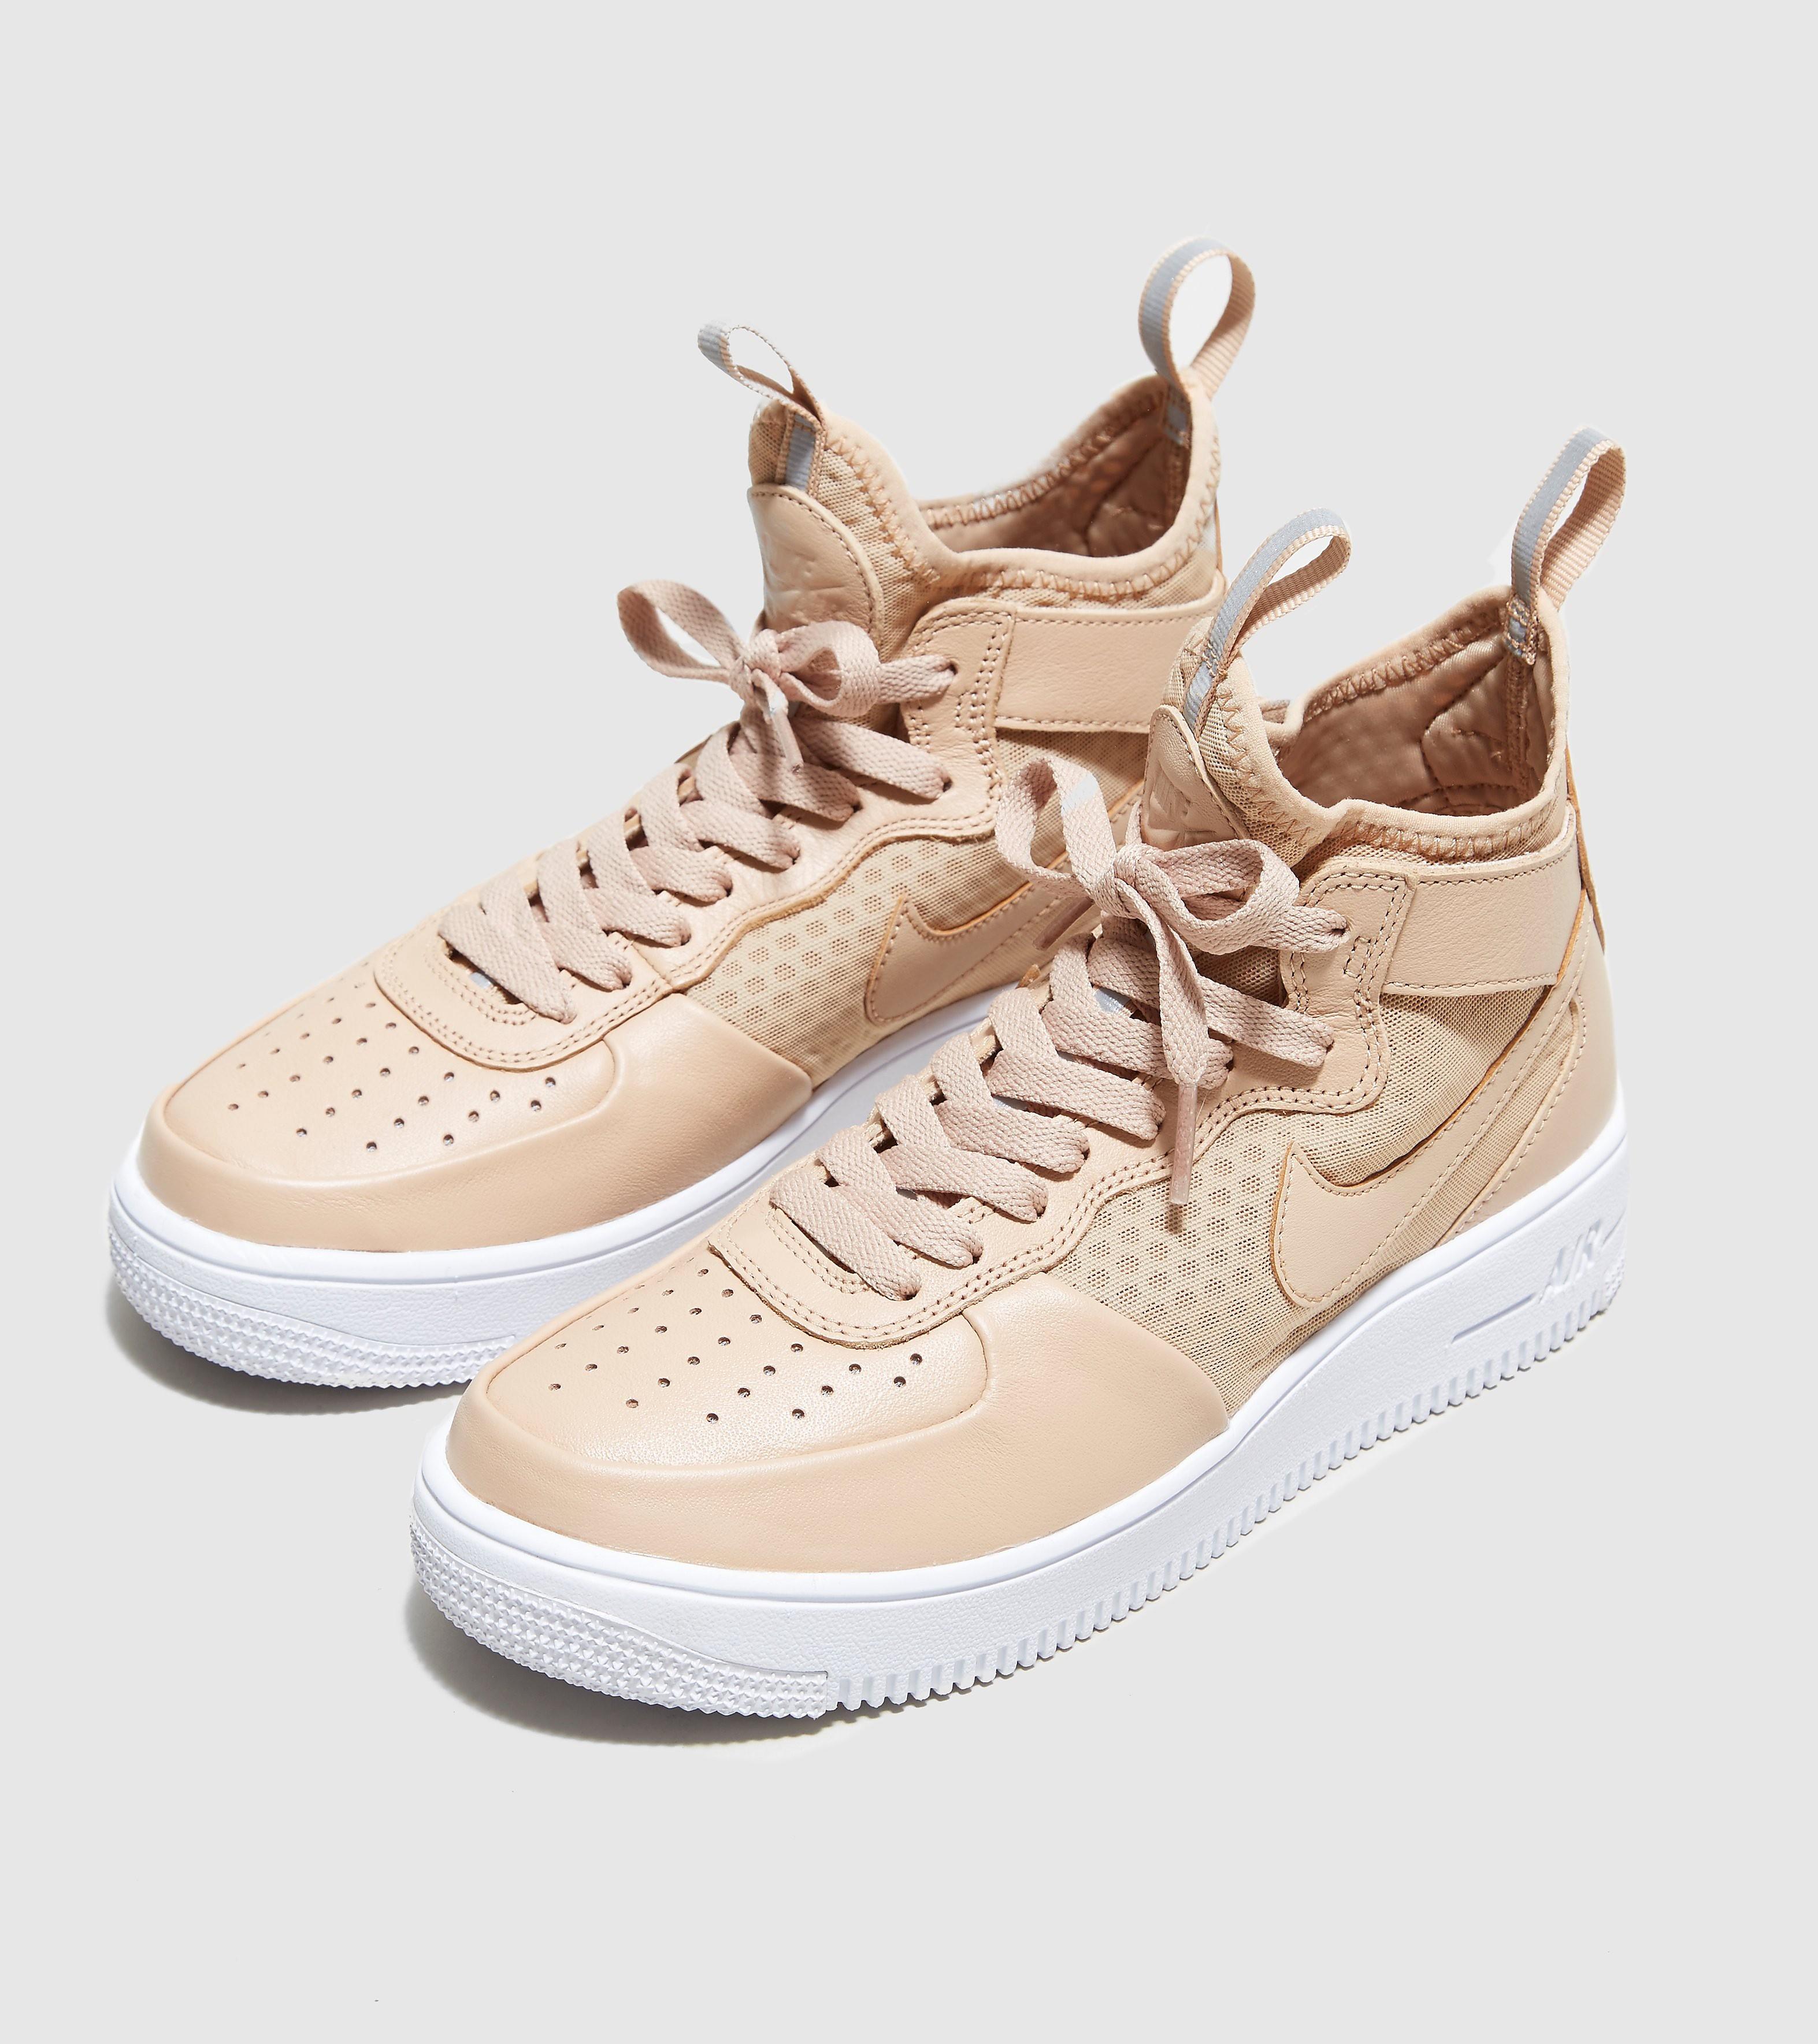 Nike Air Force 1 Ultraforce Women's